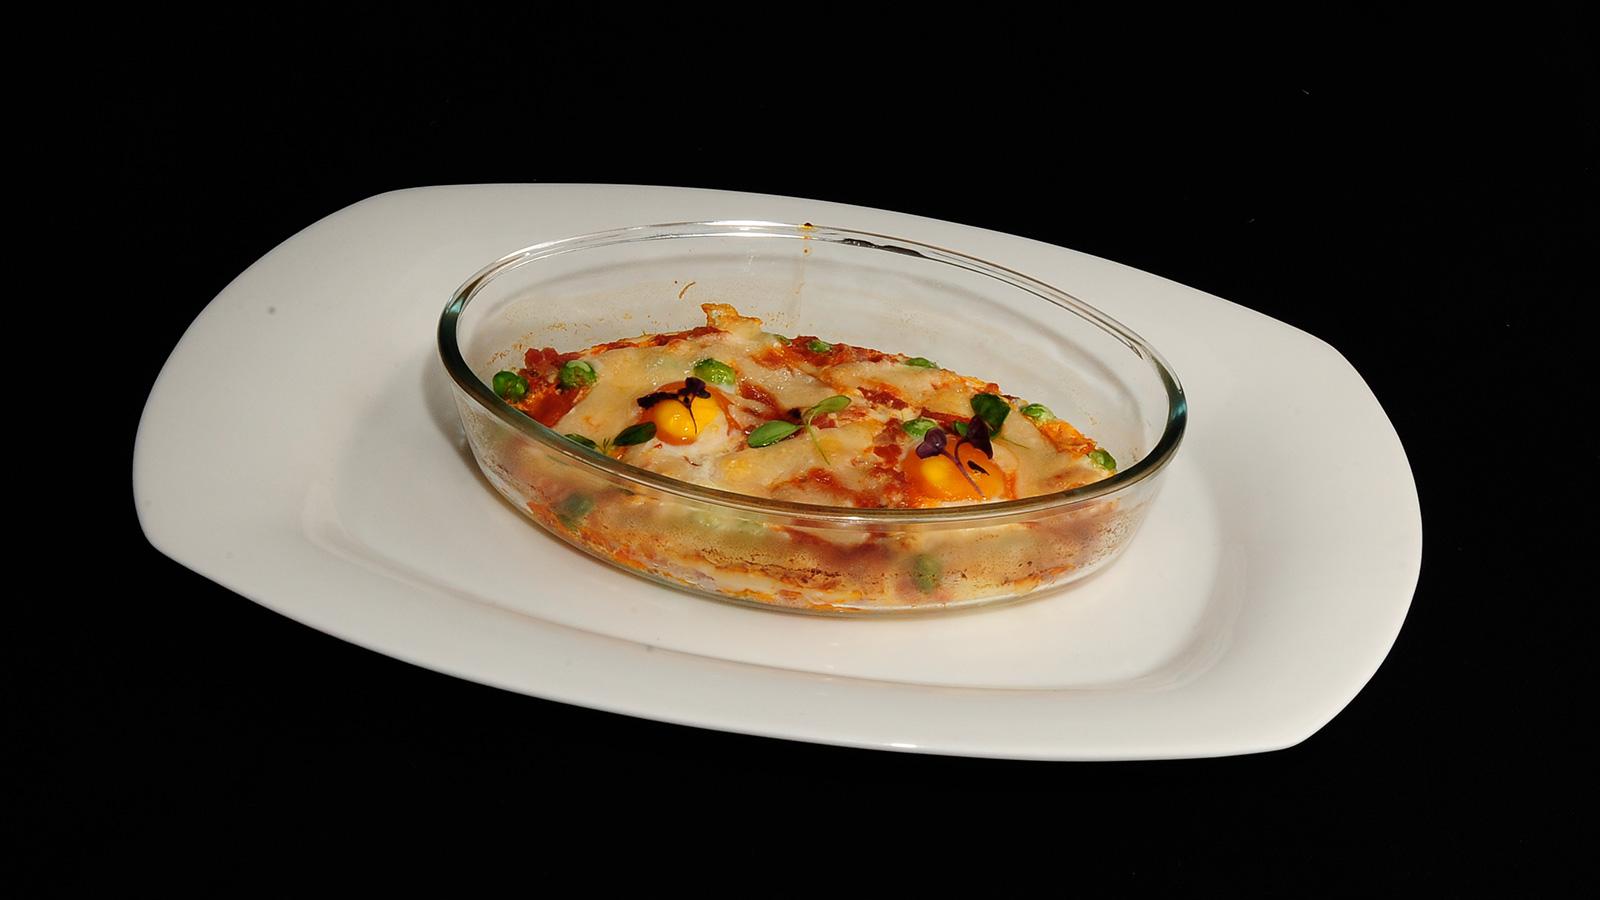 Huevos a la flamenca sergio fern ndez receta canal for Canal cocina sergio fernandez